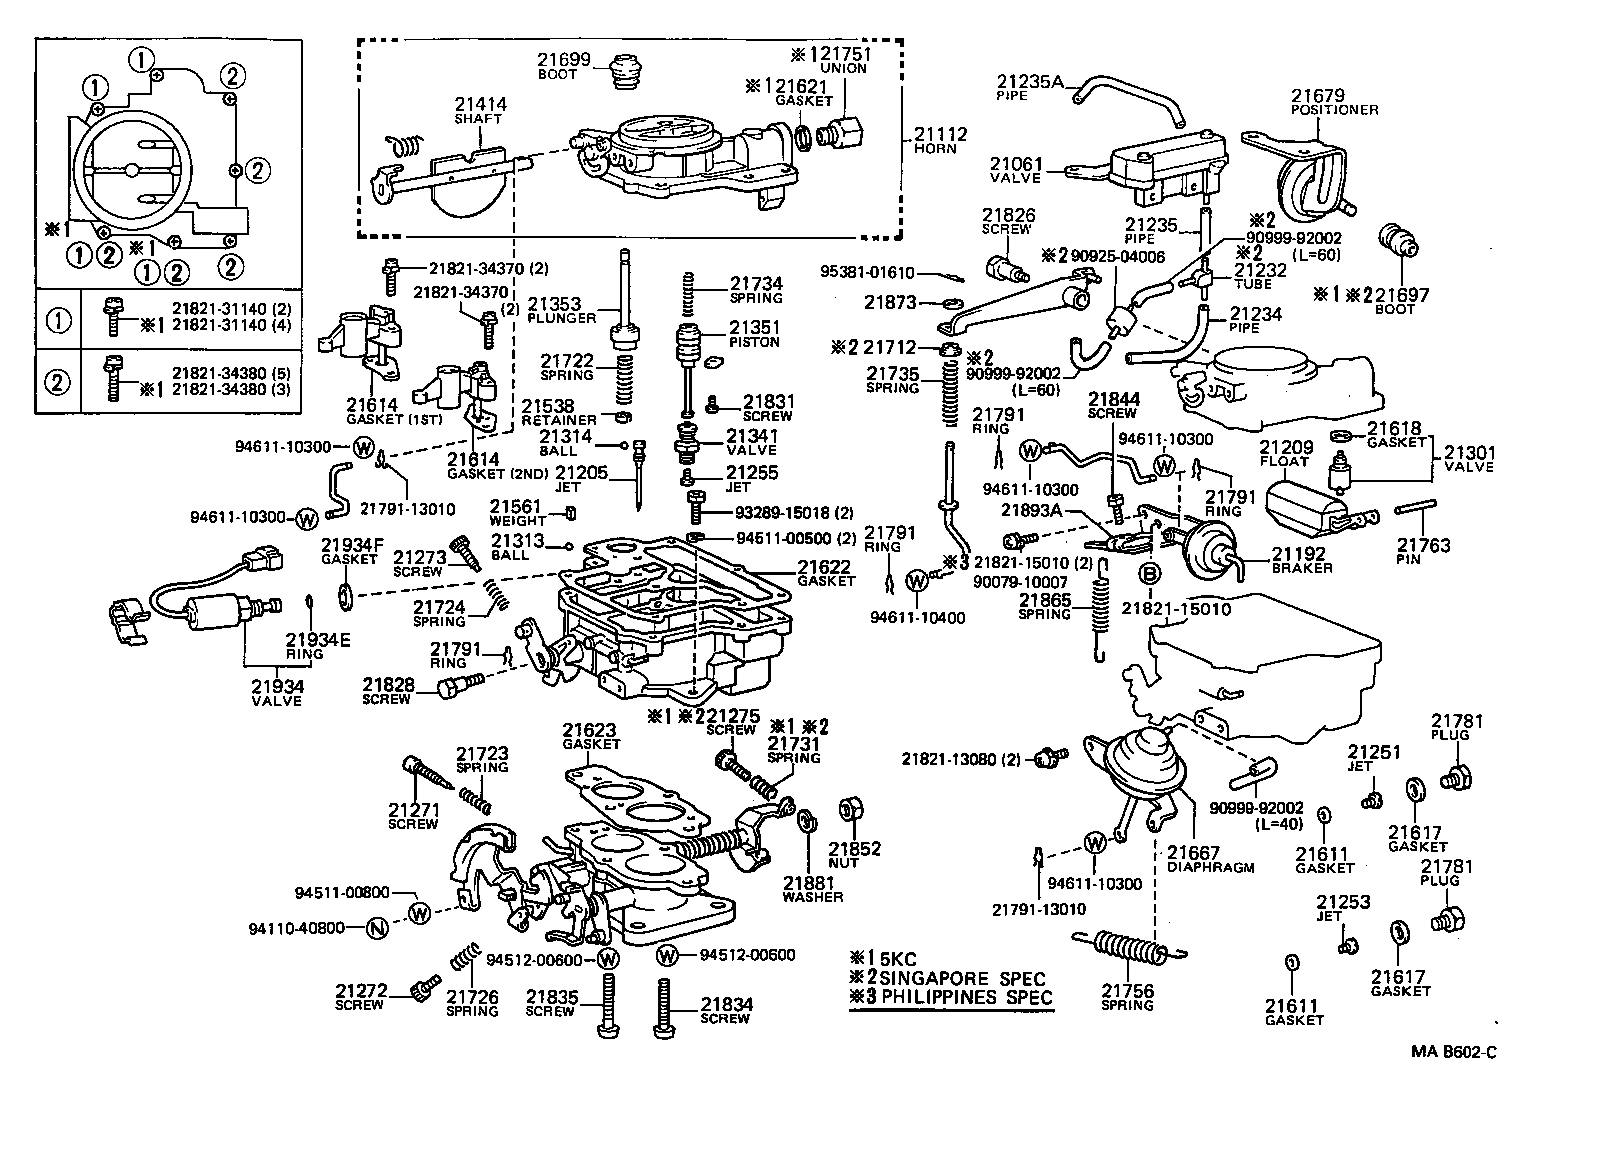 toyota liteacekm36lv-jr - tool-engine-fuel